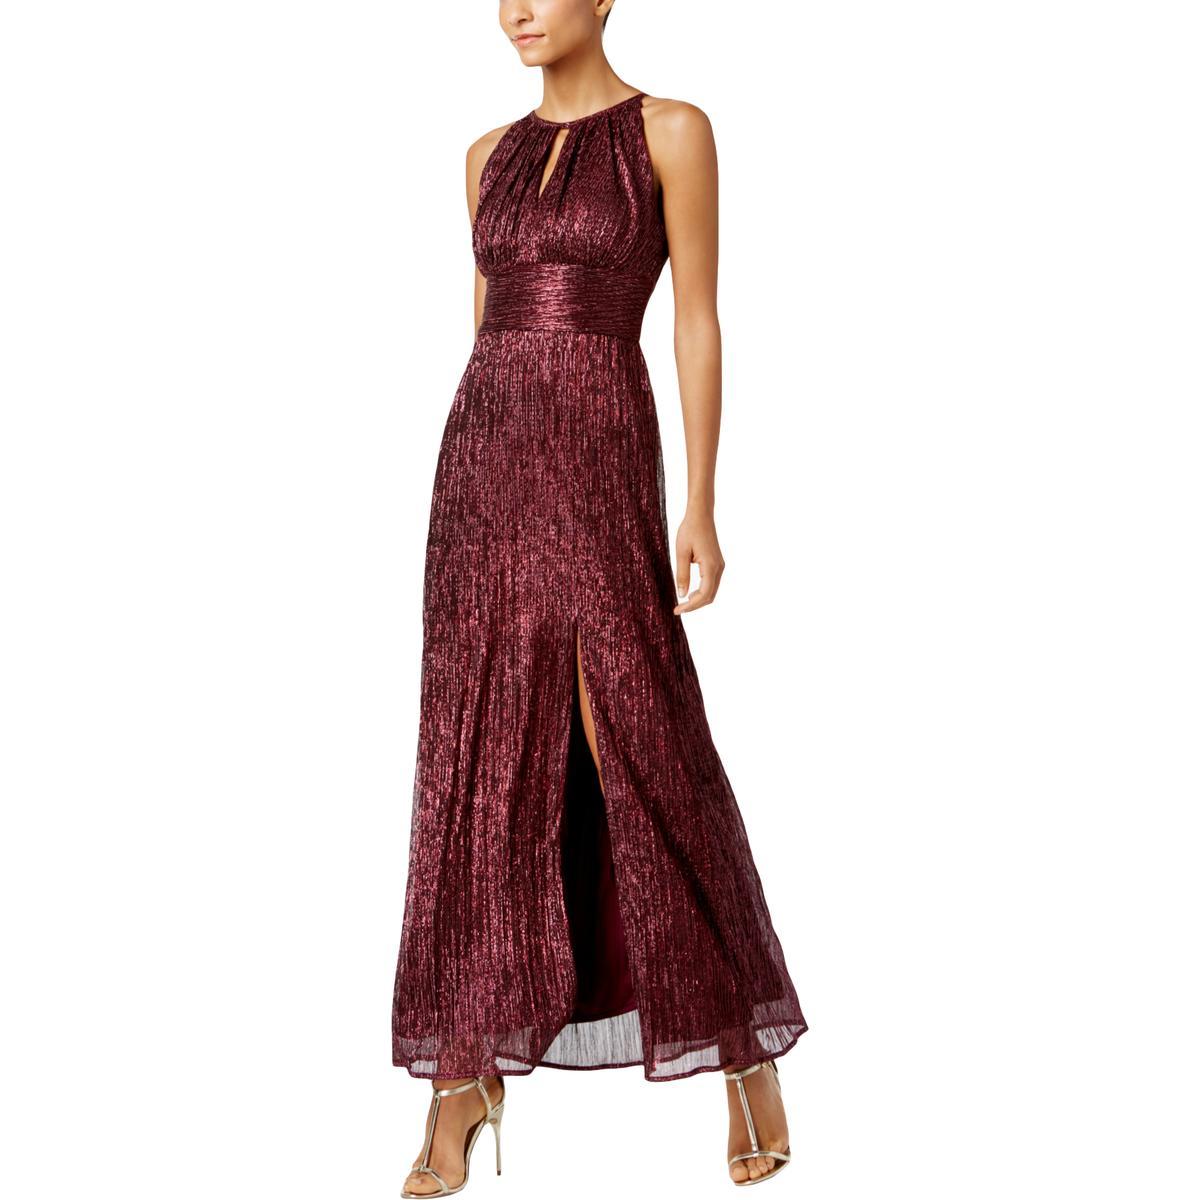 92f950e0e2 Details about R   M Richards Womens Red Halter Metallic Party Evening Dress  4 BHFO 0087